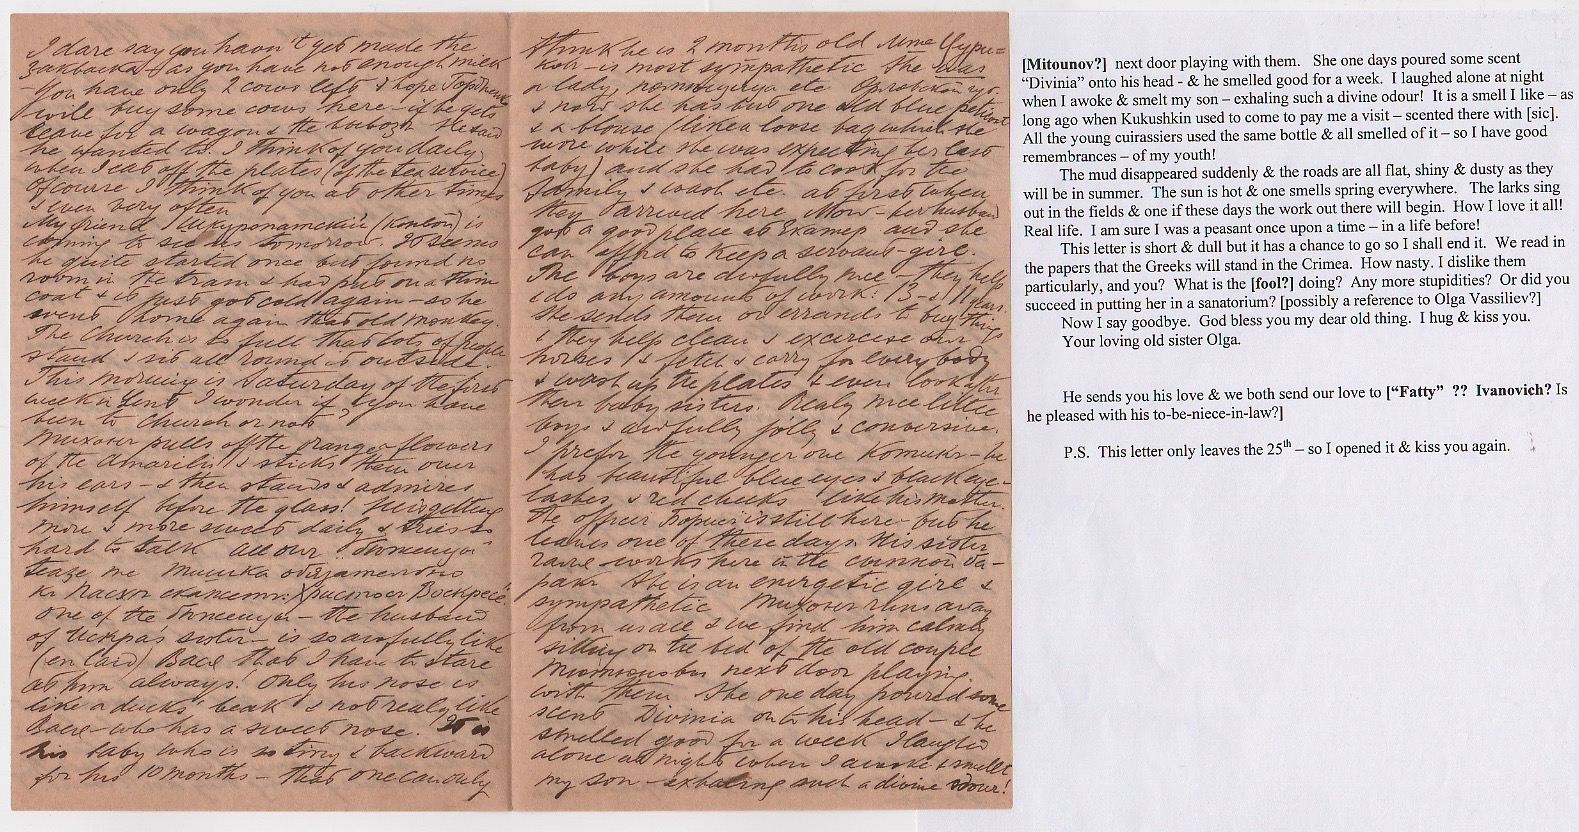 Royalty Grand Duchess Olga Correspondence To Her Sister Grand Duchess Xenia 1916-1920 - Image 11 of 47